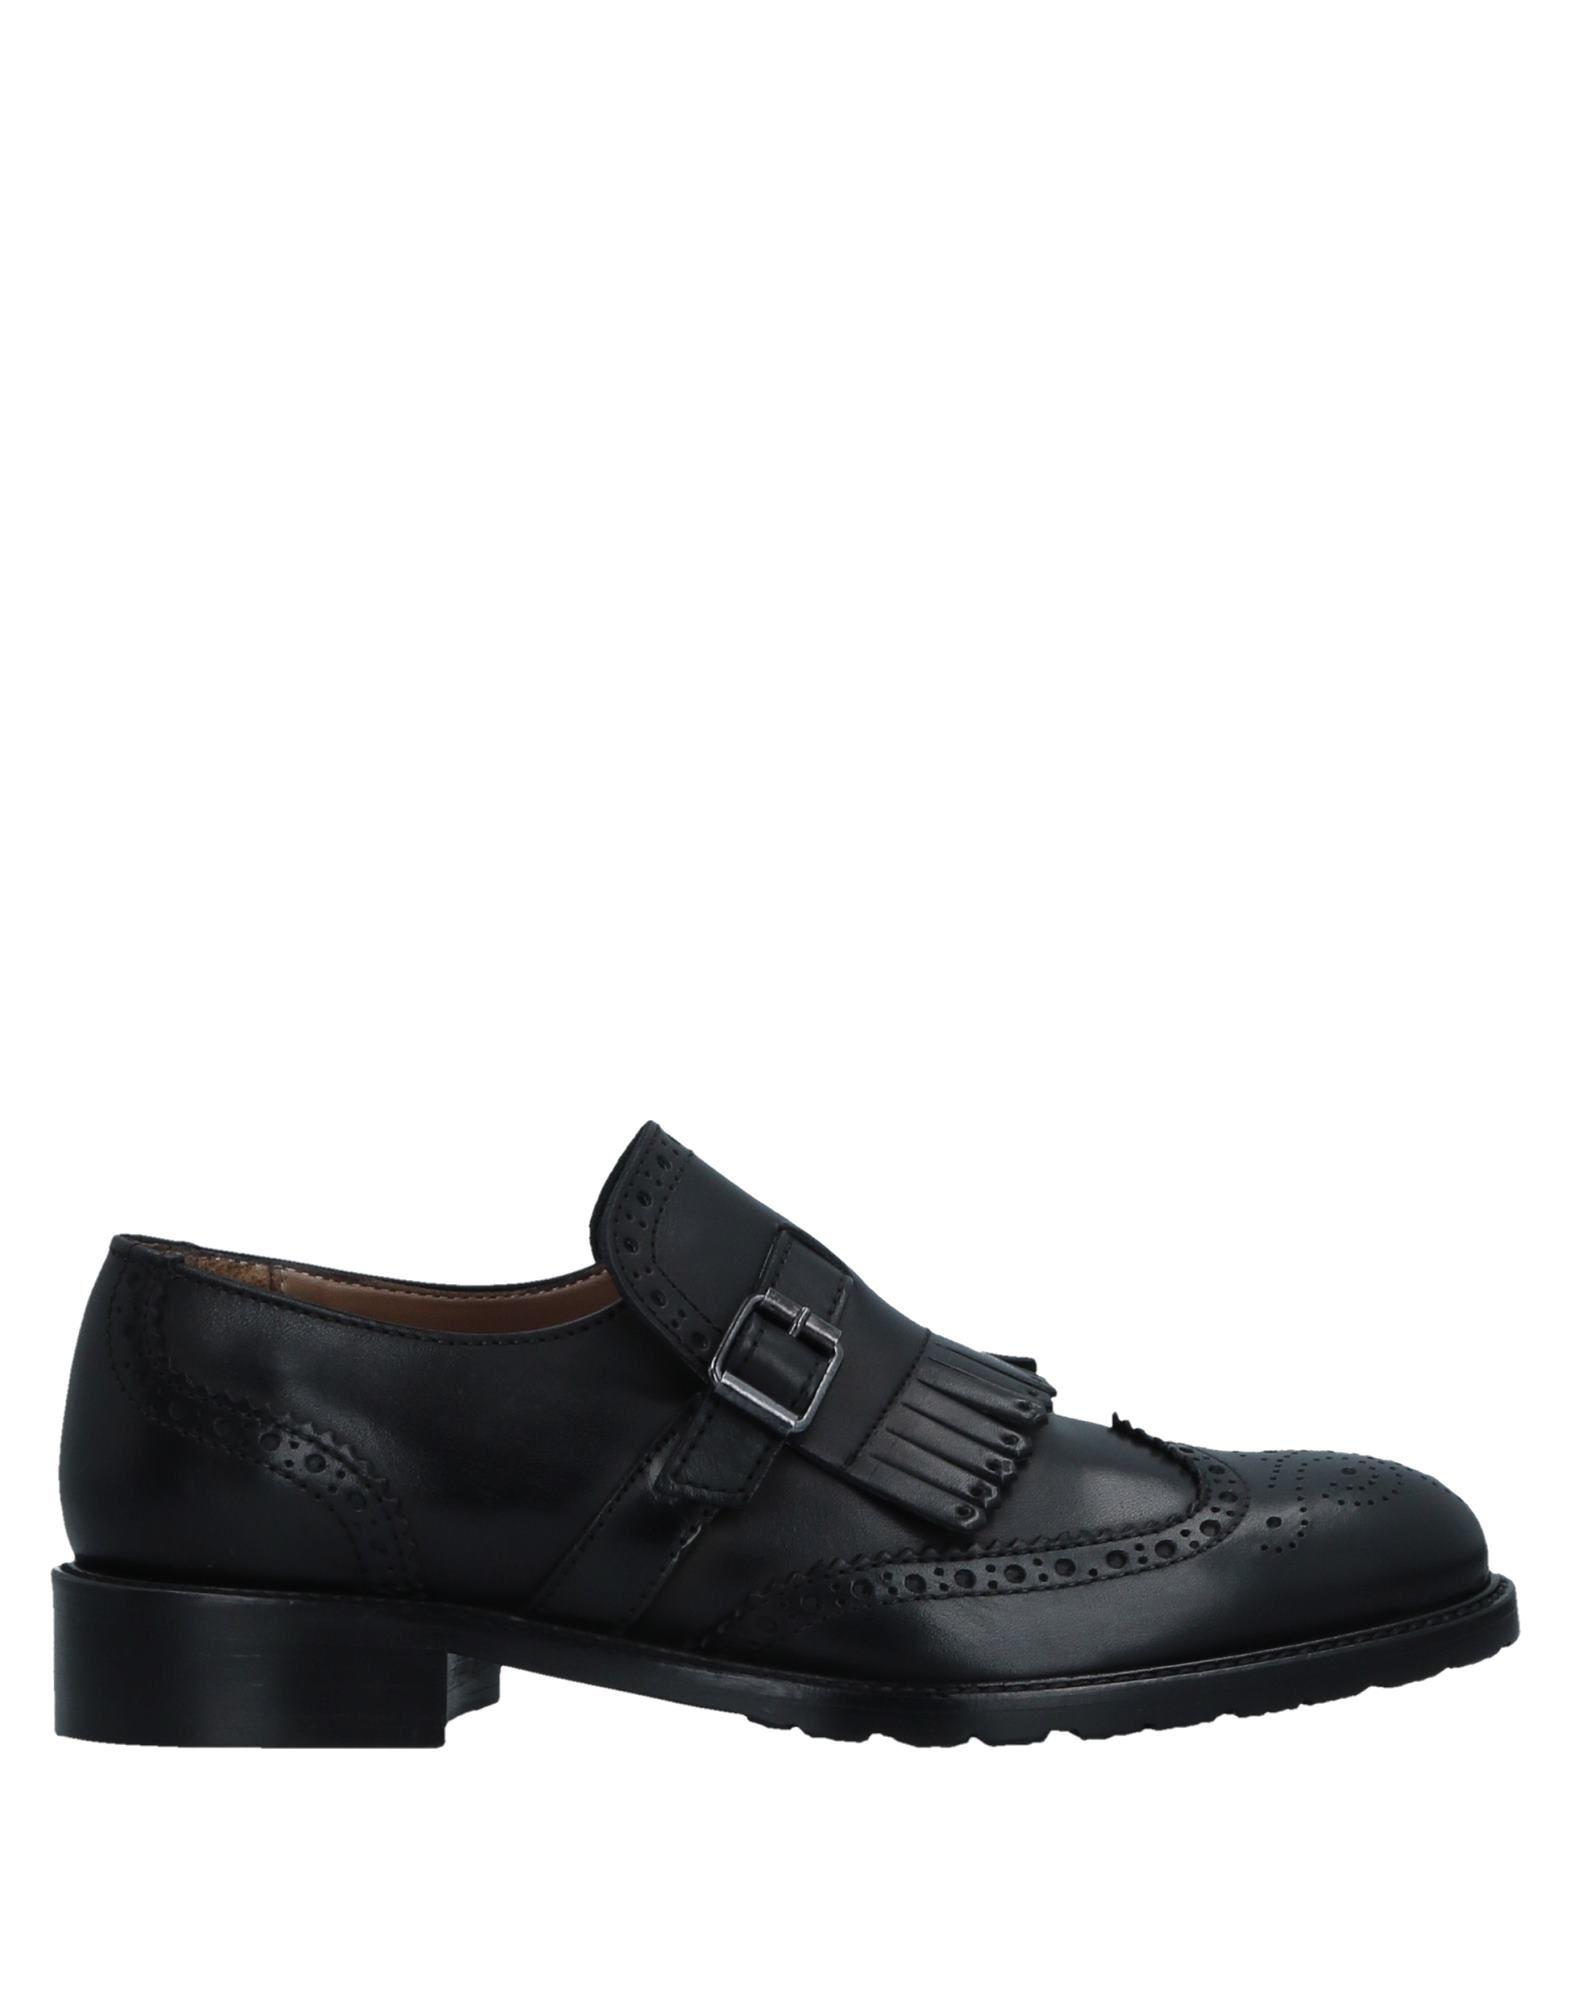 Rabatt Schuhe Stefano Branchini Mokassins Damen  11521628SD